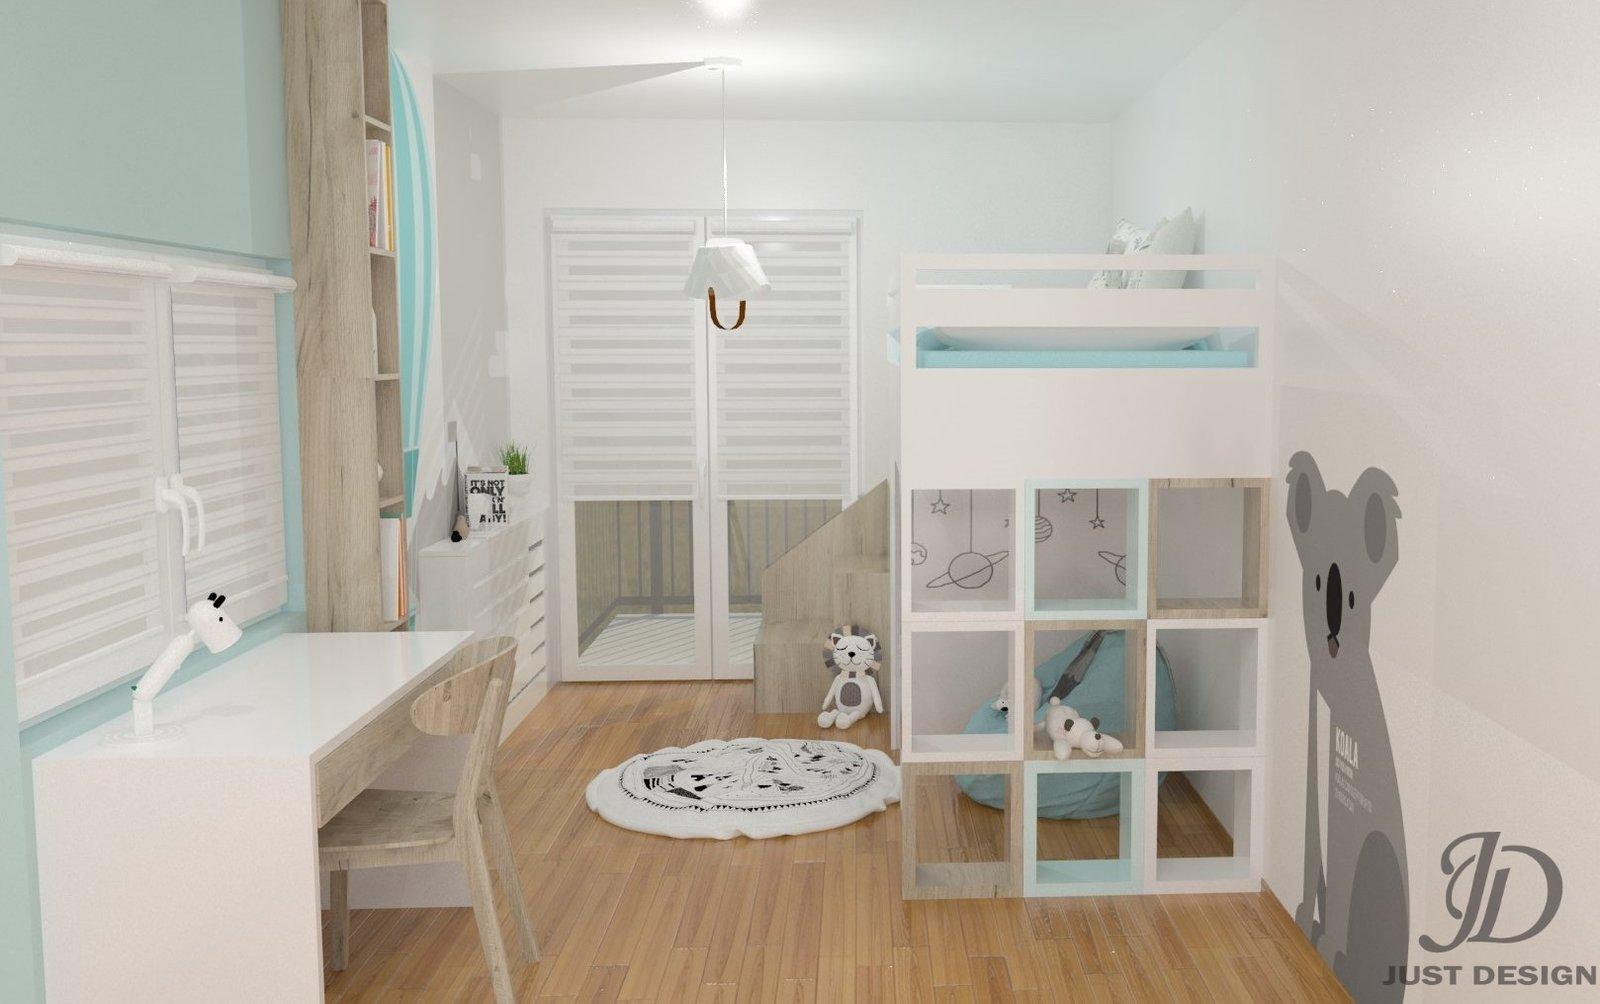 vnatresno ureduvanje detska soba